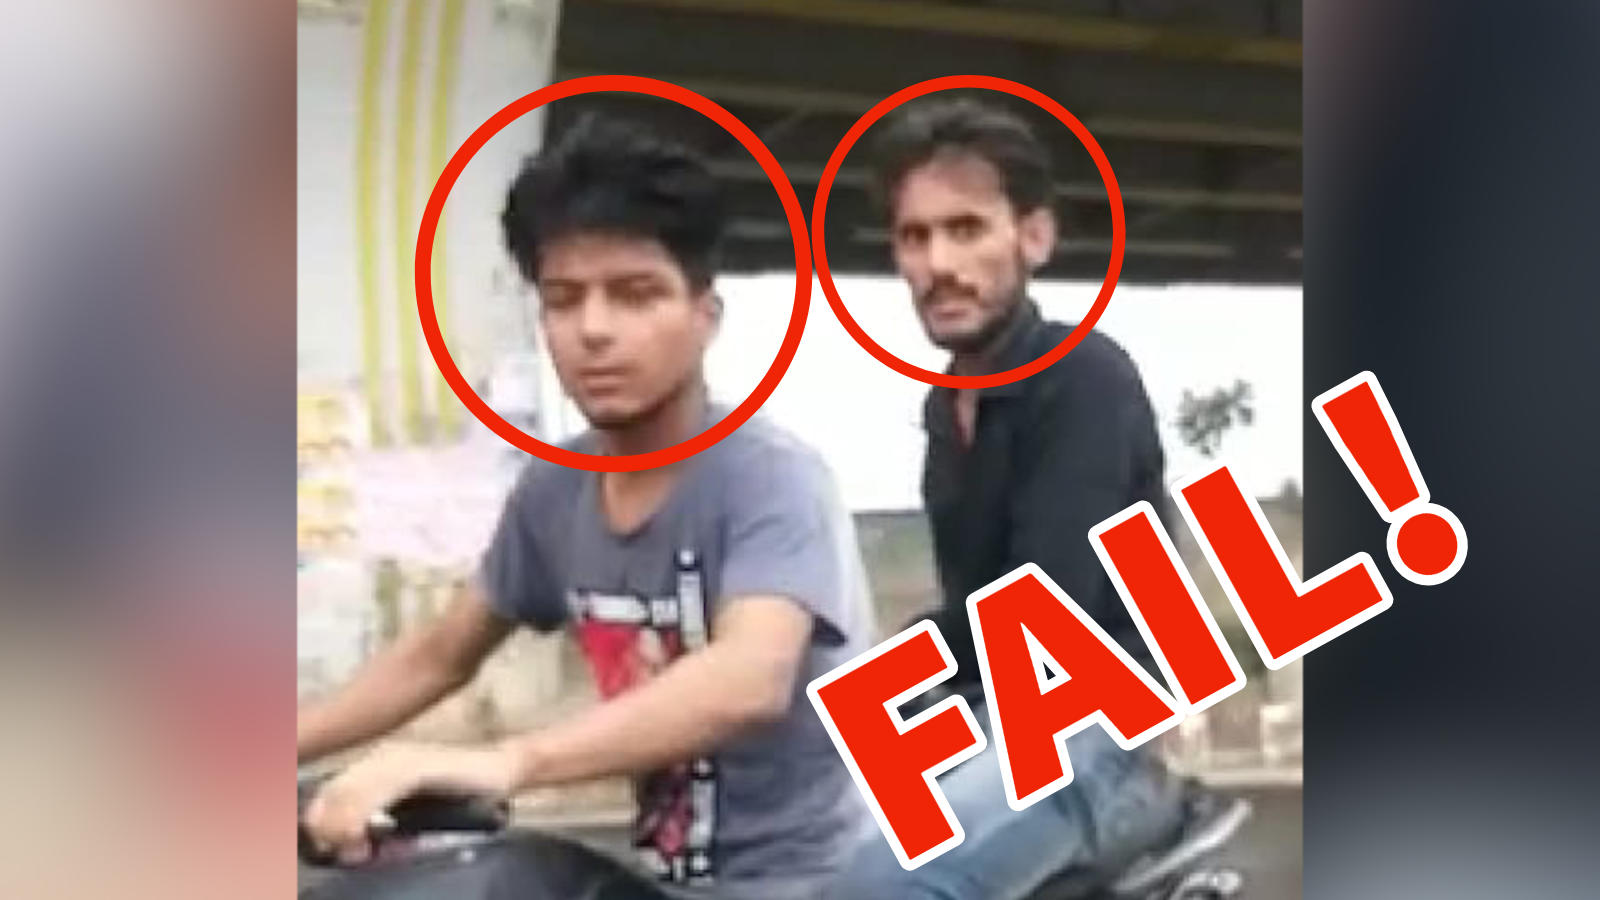 watch-amateur-bike-borne-snatchers-steal-smartphone-fail-miserably